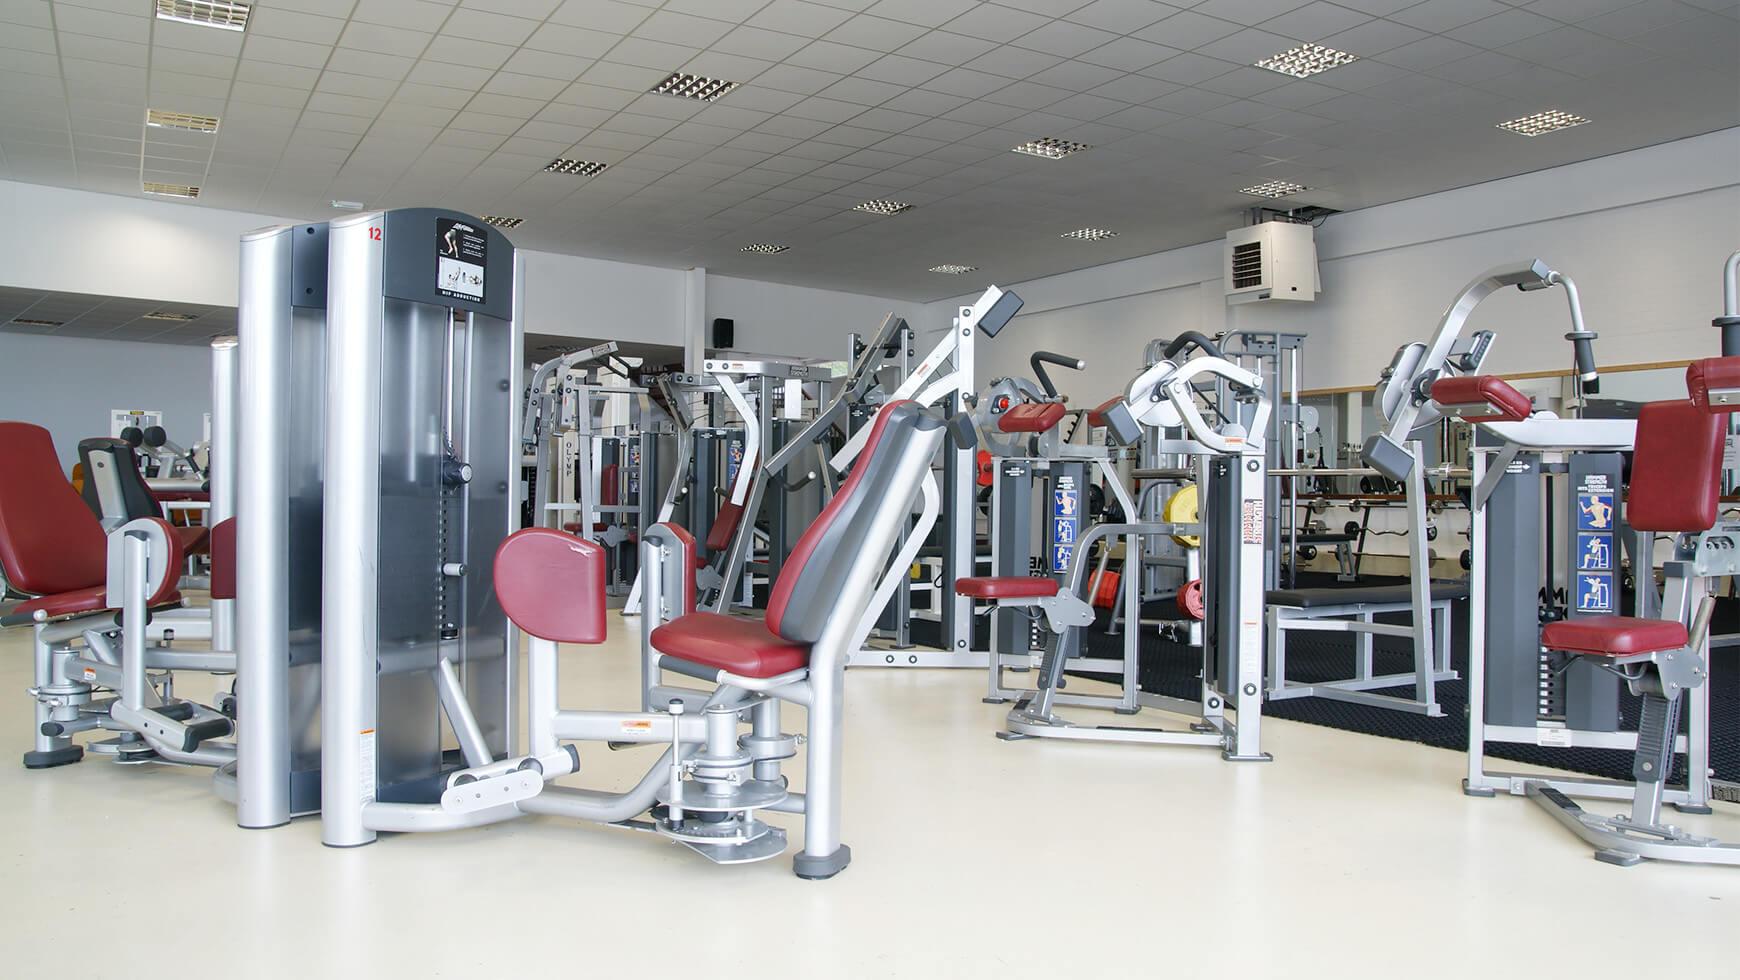 Fitnessruimte Sportcentrum Bfit